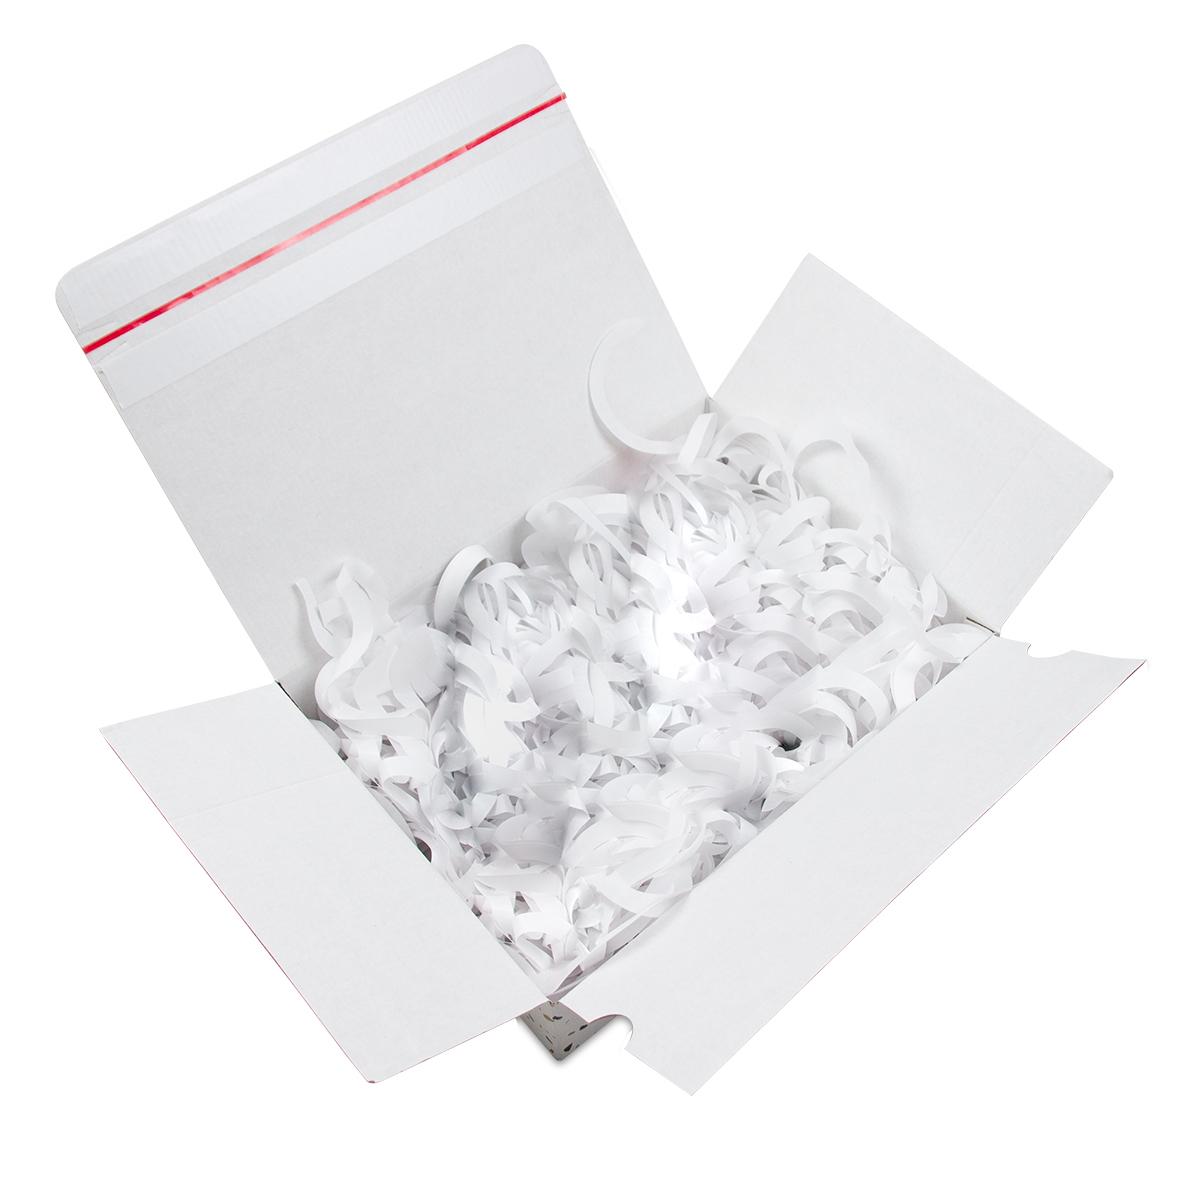 Confettidozen met plakstrip